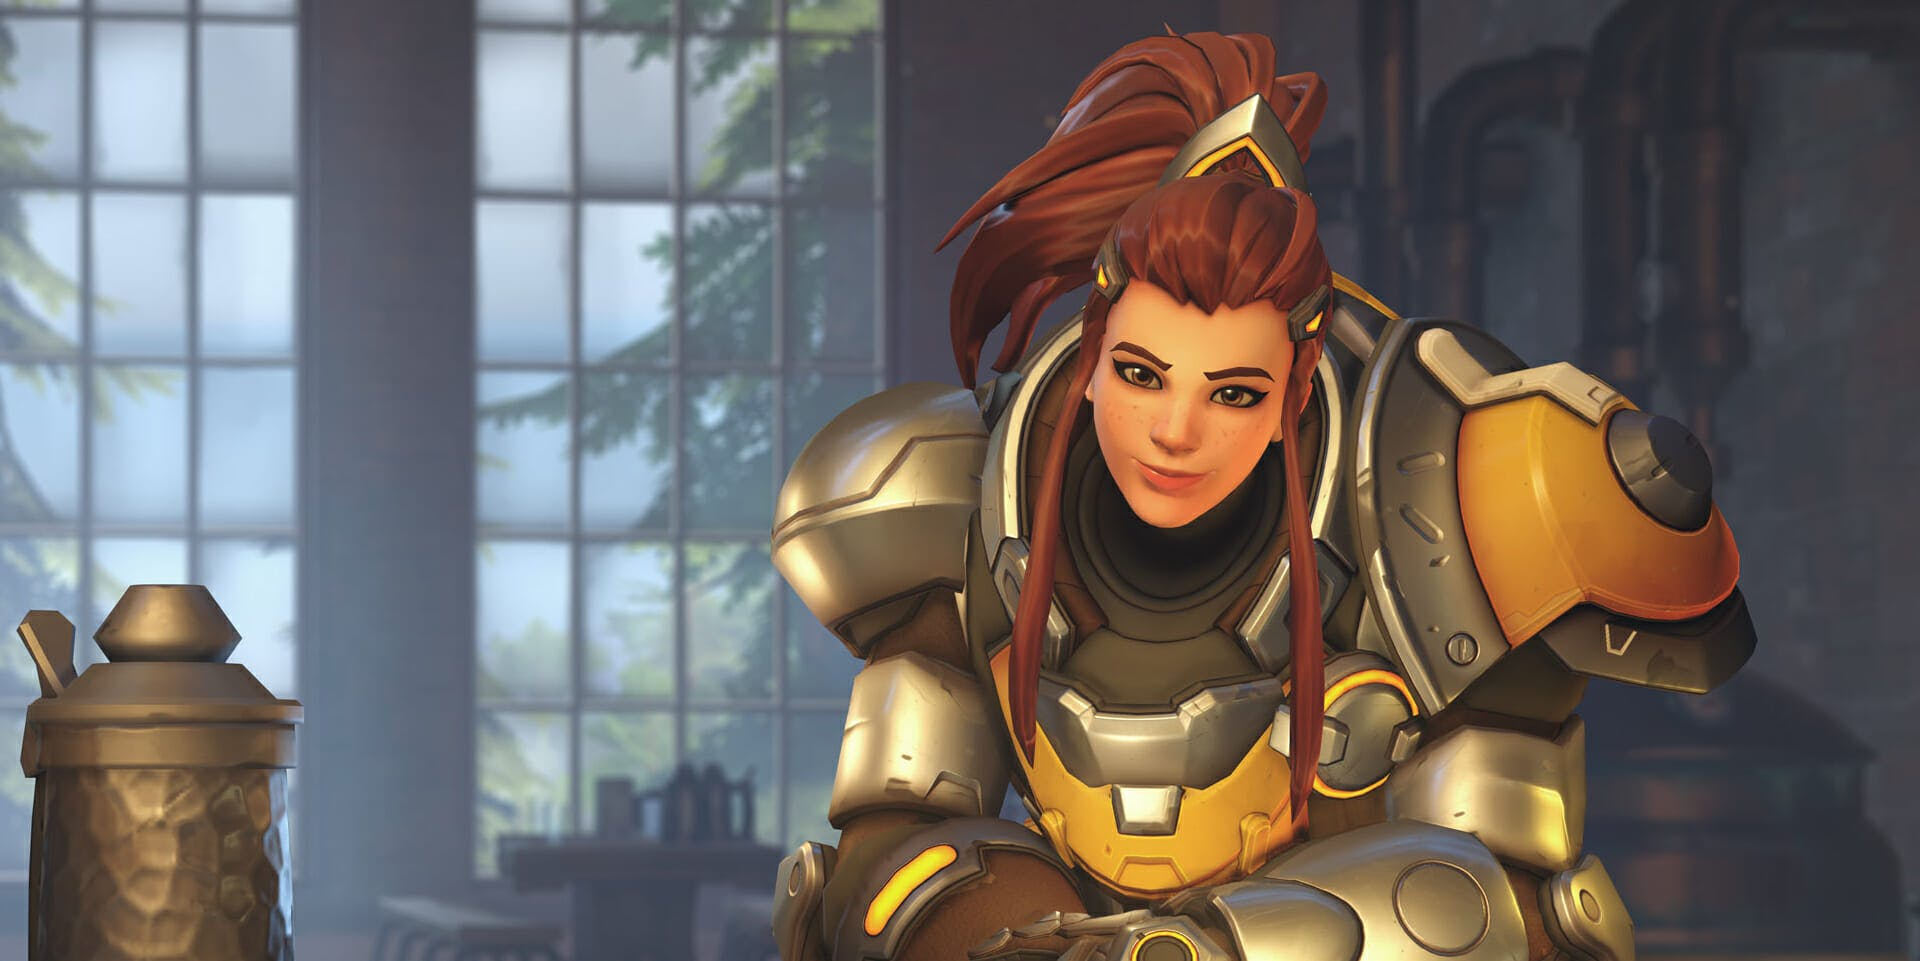 Best Overwatch Character Brigitte